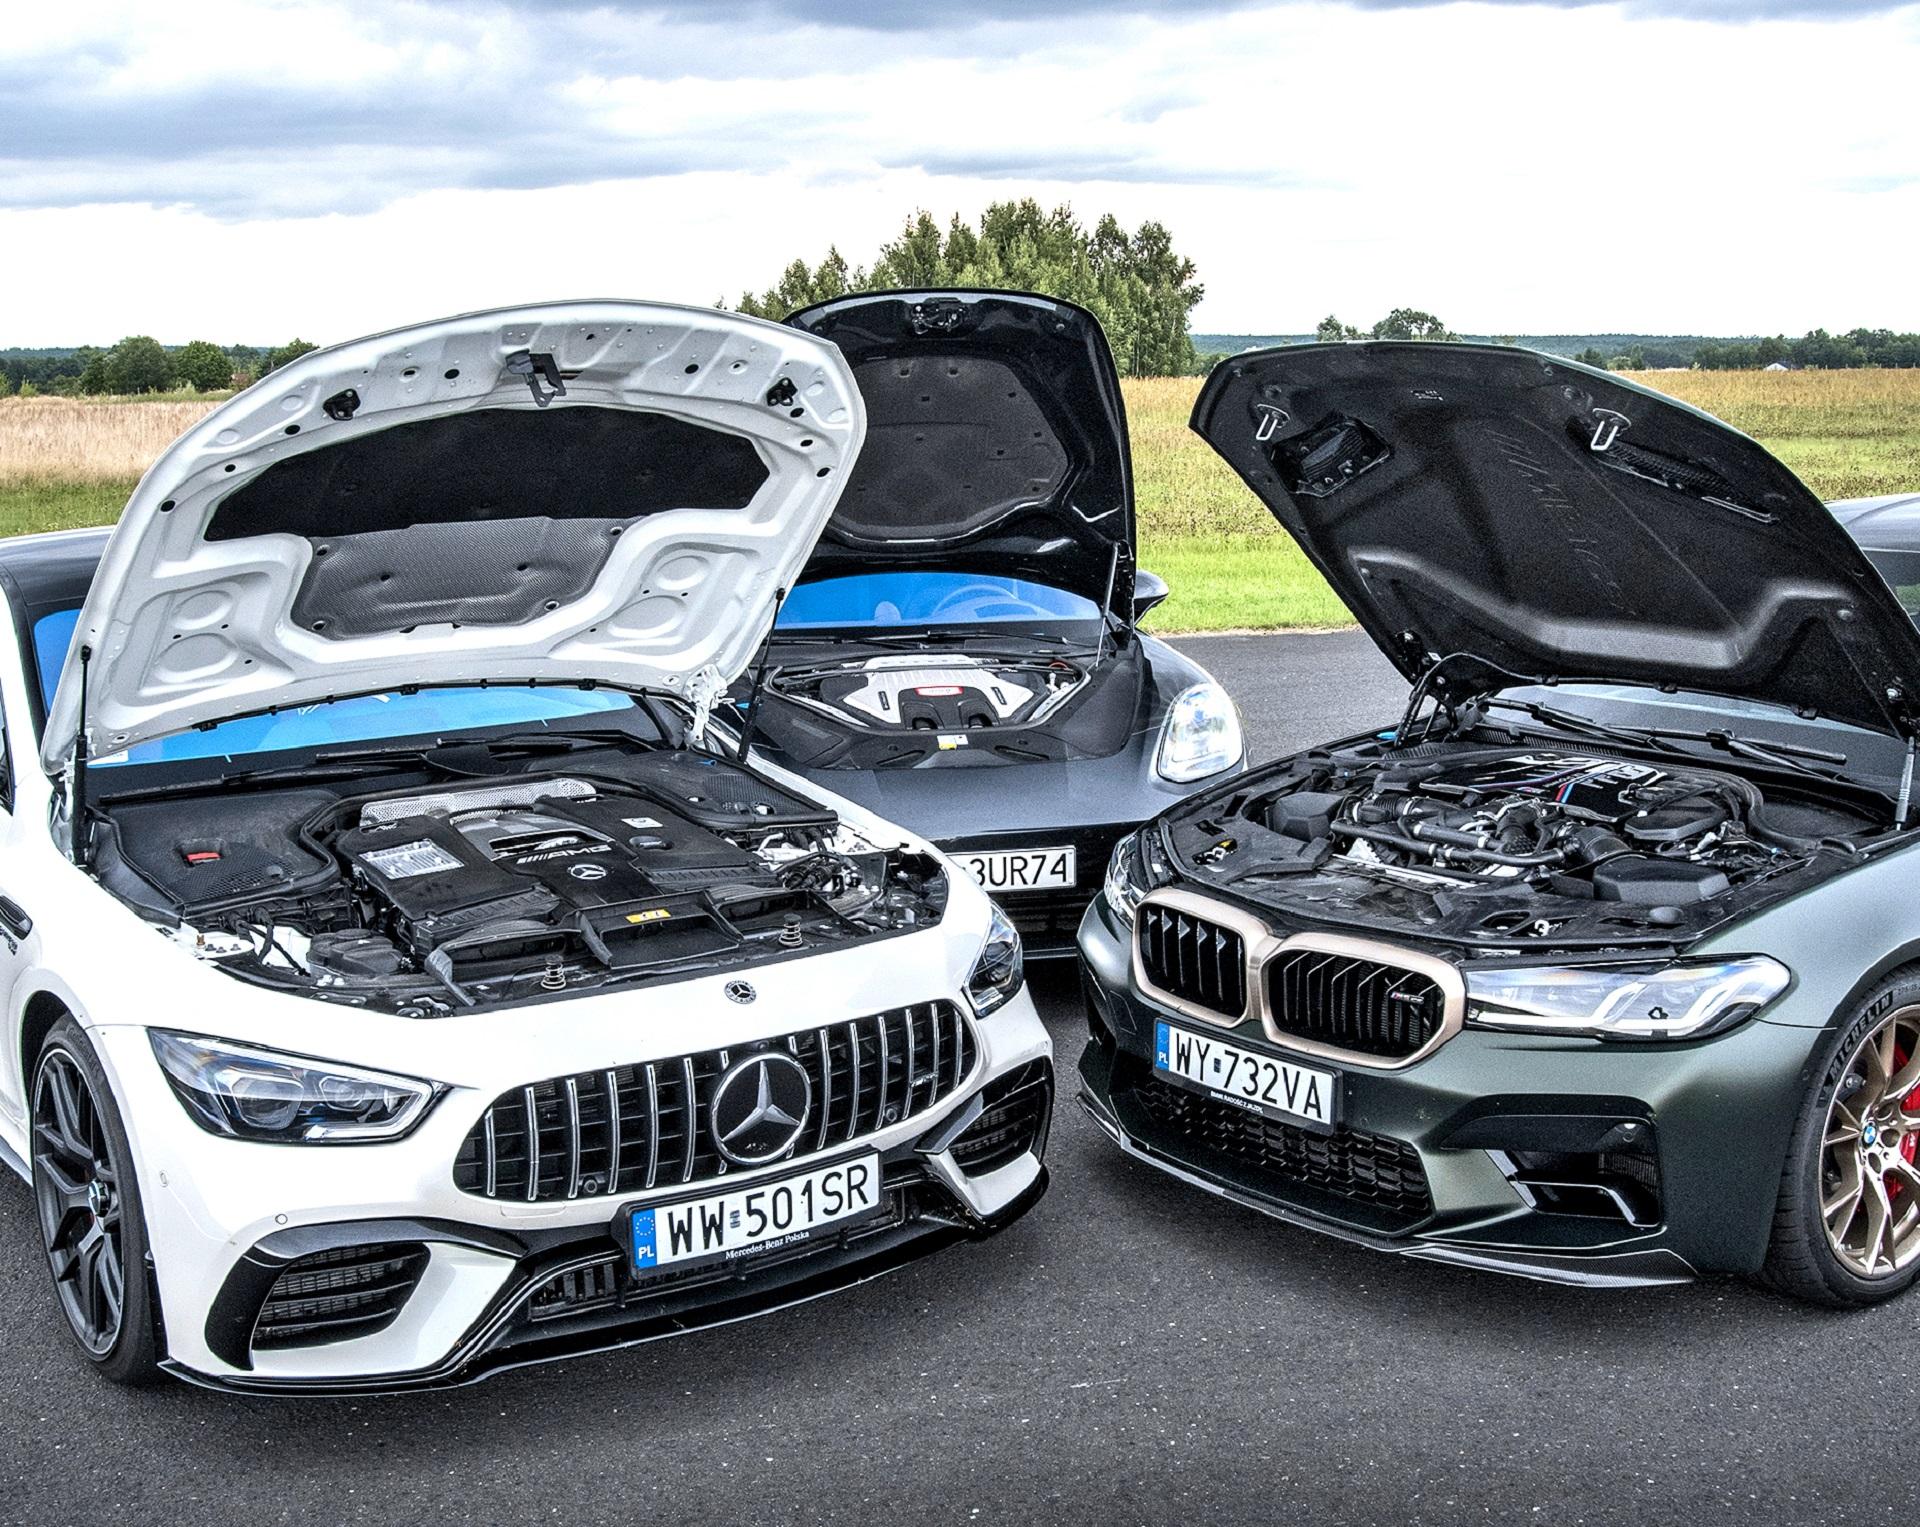 BMW M5 CS, Mercedes-AMG GT 4d 63 S, Porsche Panamera Turbo S - silniki